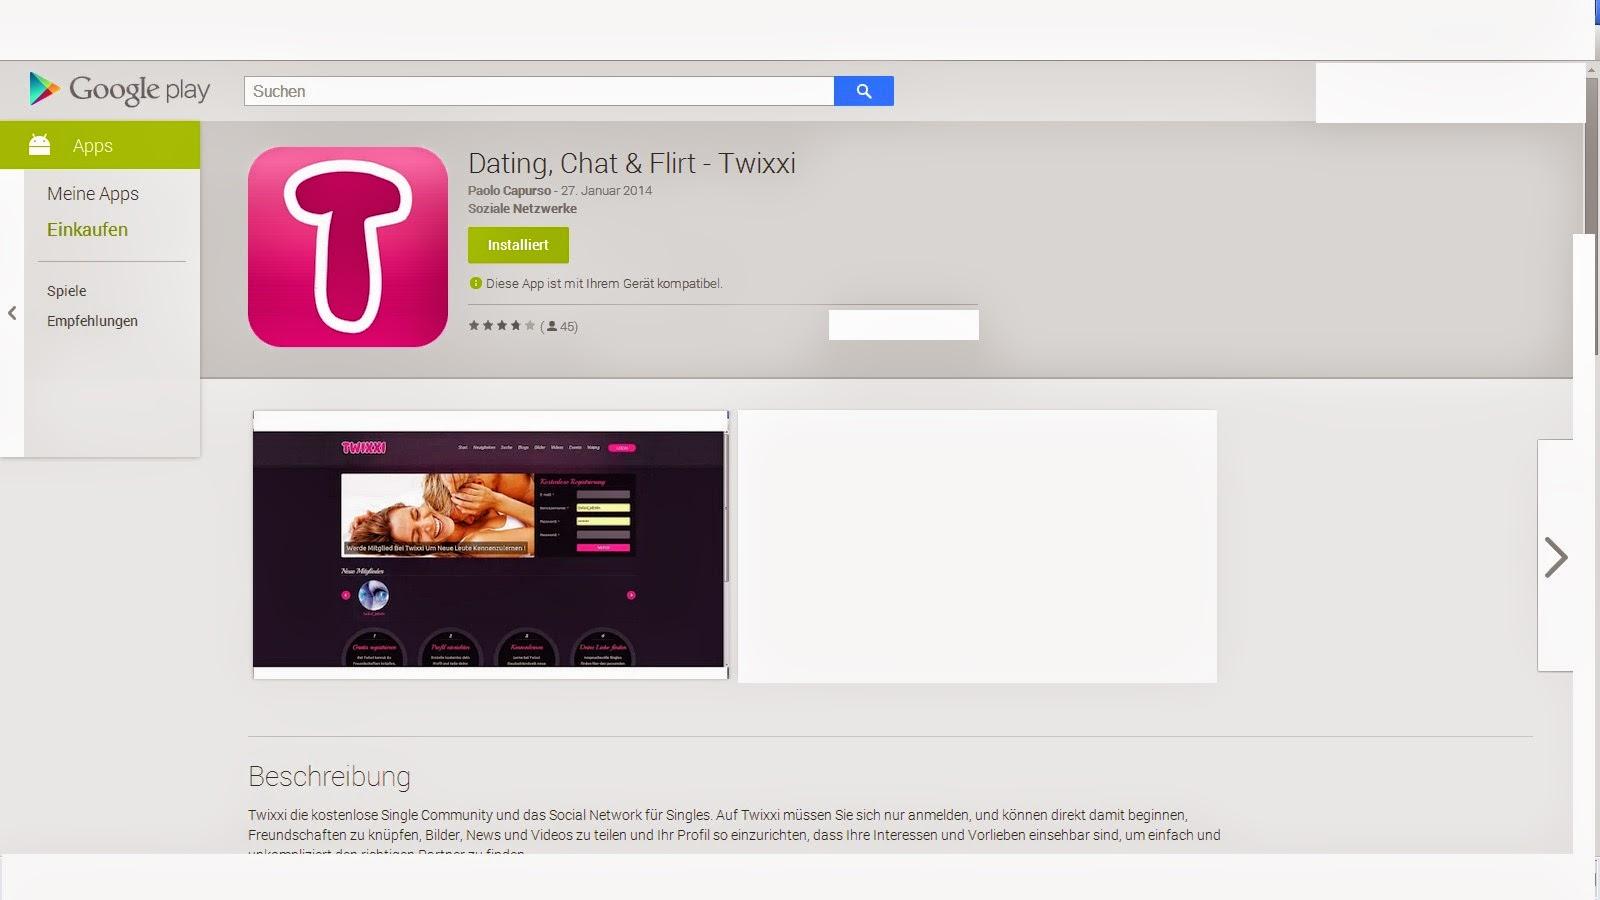 kostenlose chat app Potsdam